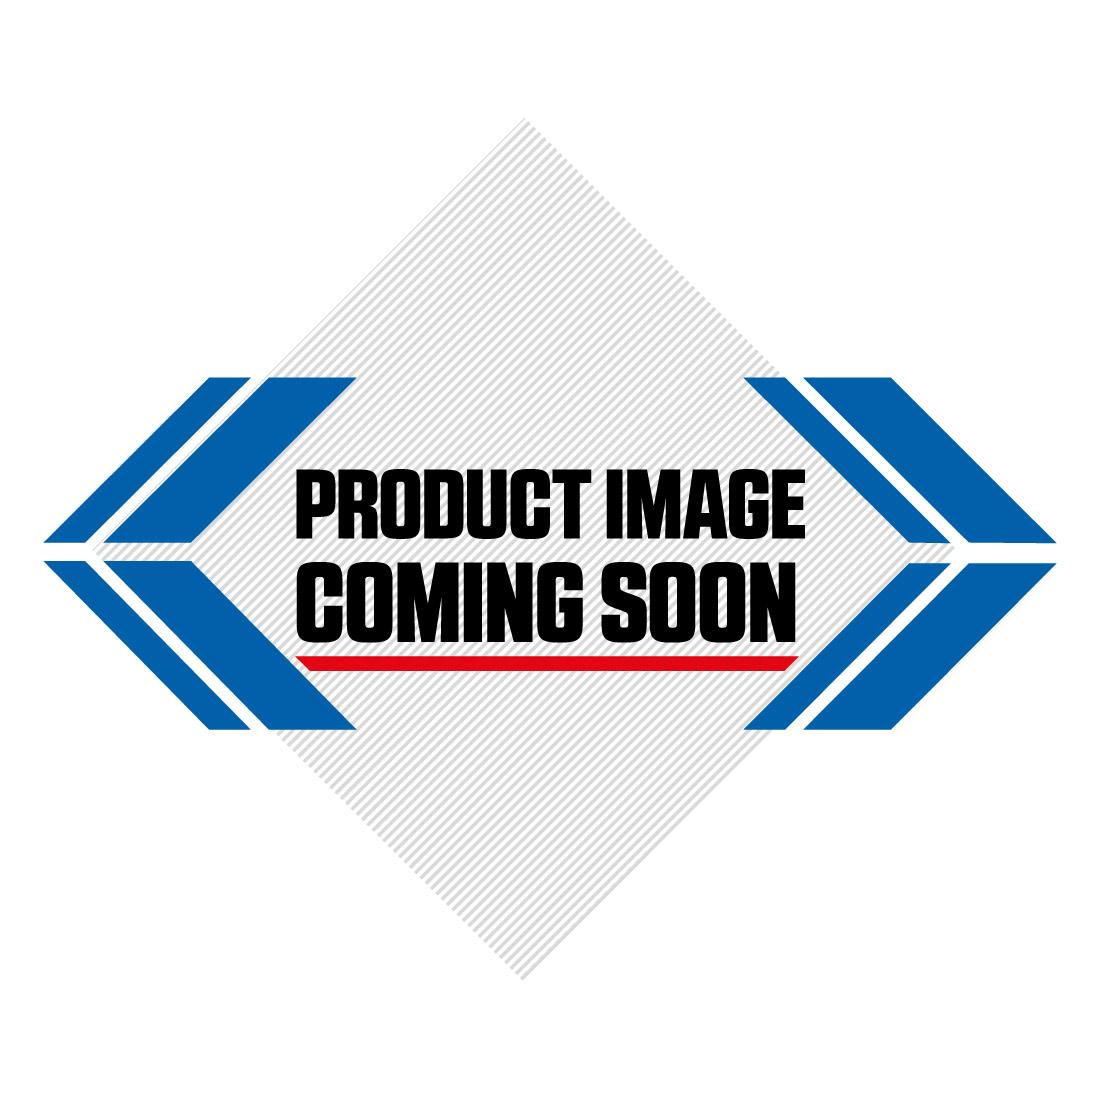 Renthal Twinring Rear Sprocket KTM SX SX-F EXC EXC-F Husqvarna TC FC TE FE - Black Image-2>